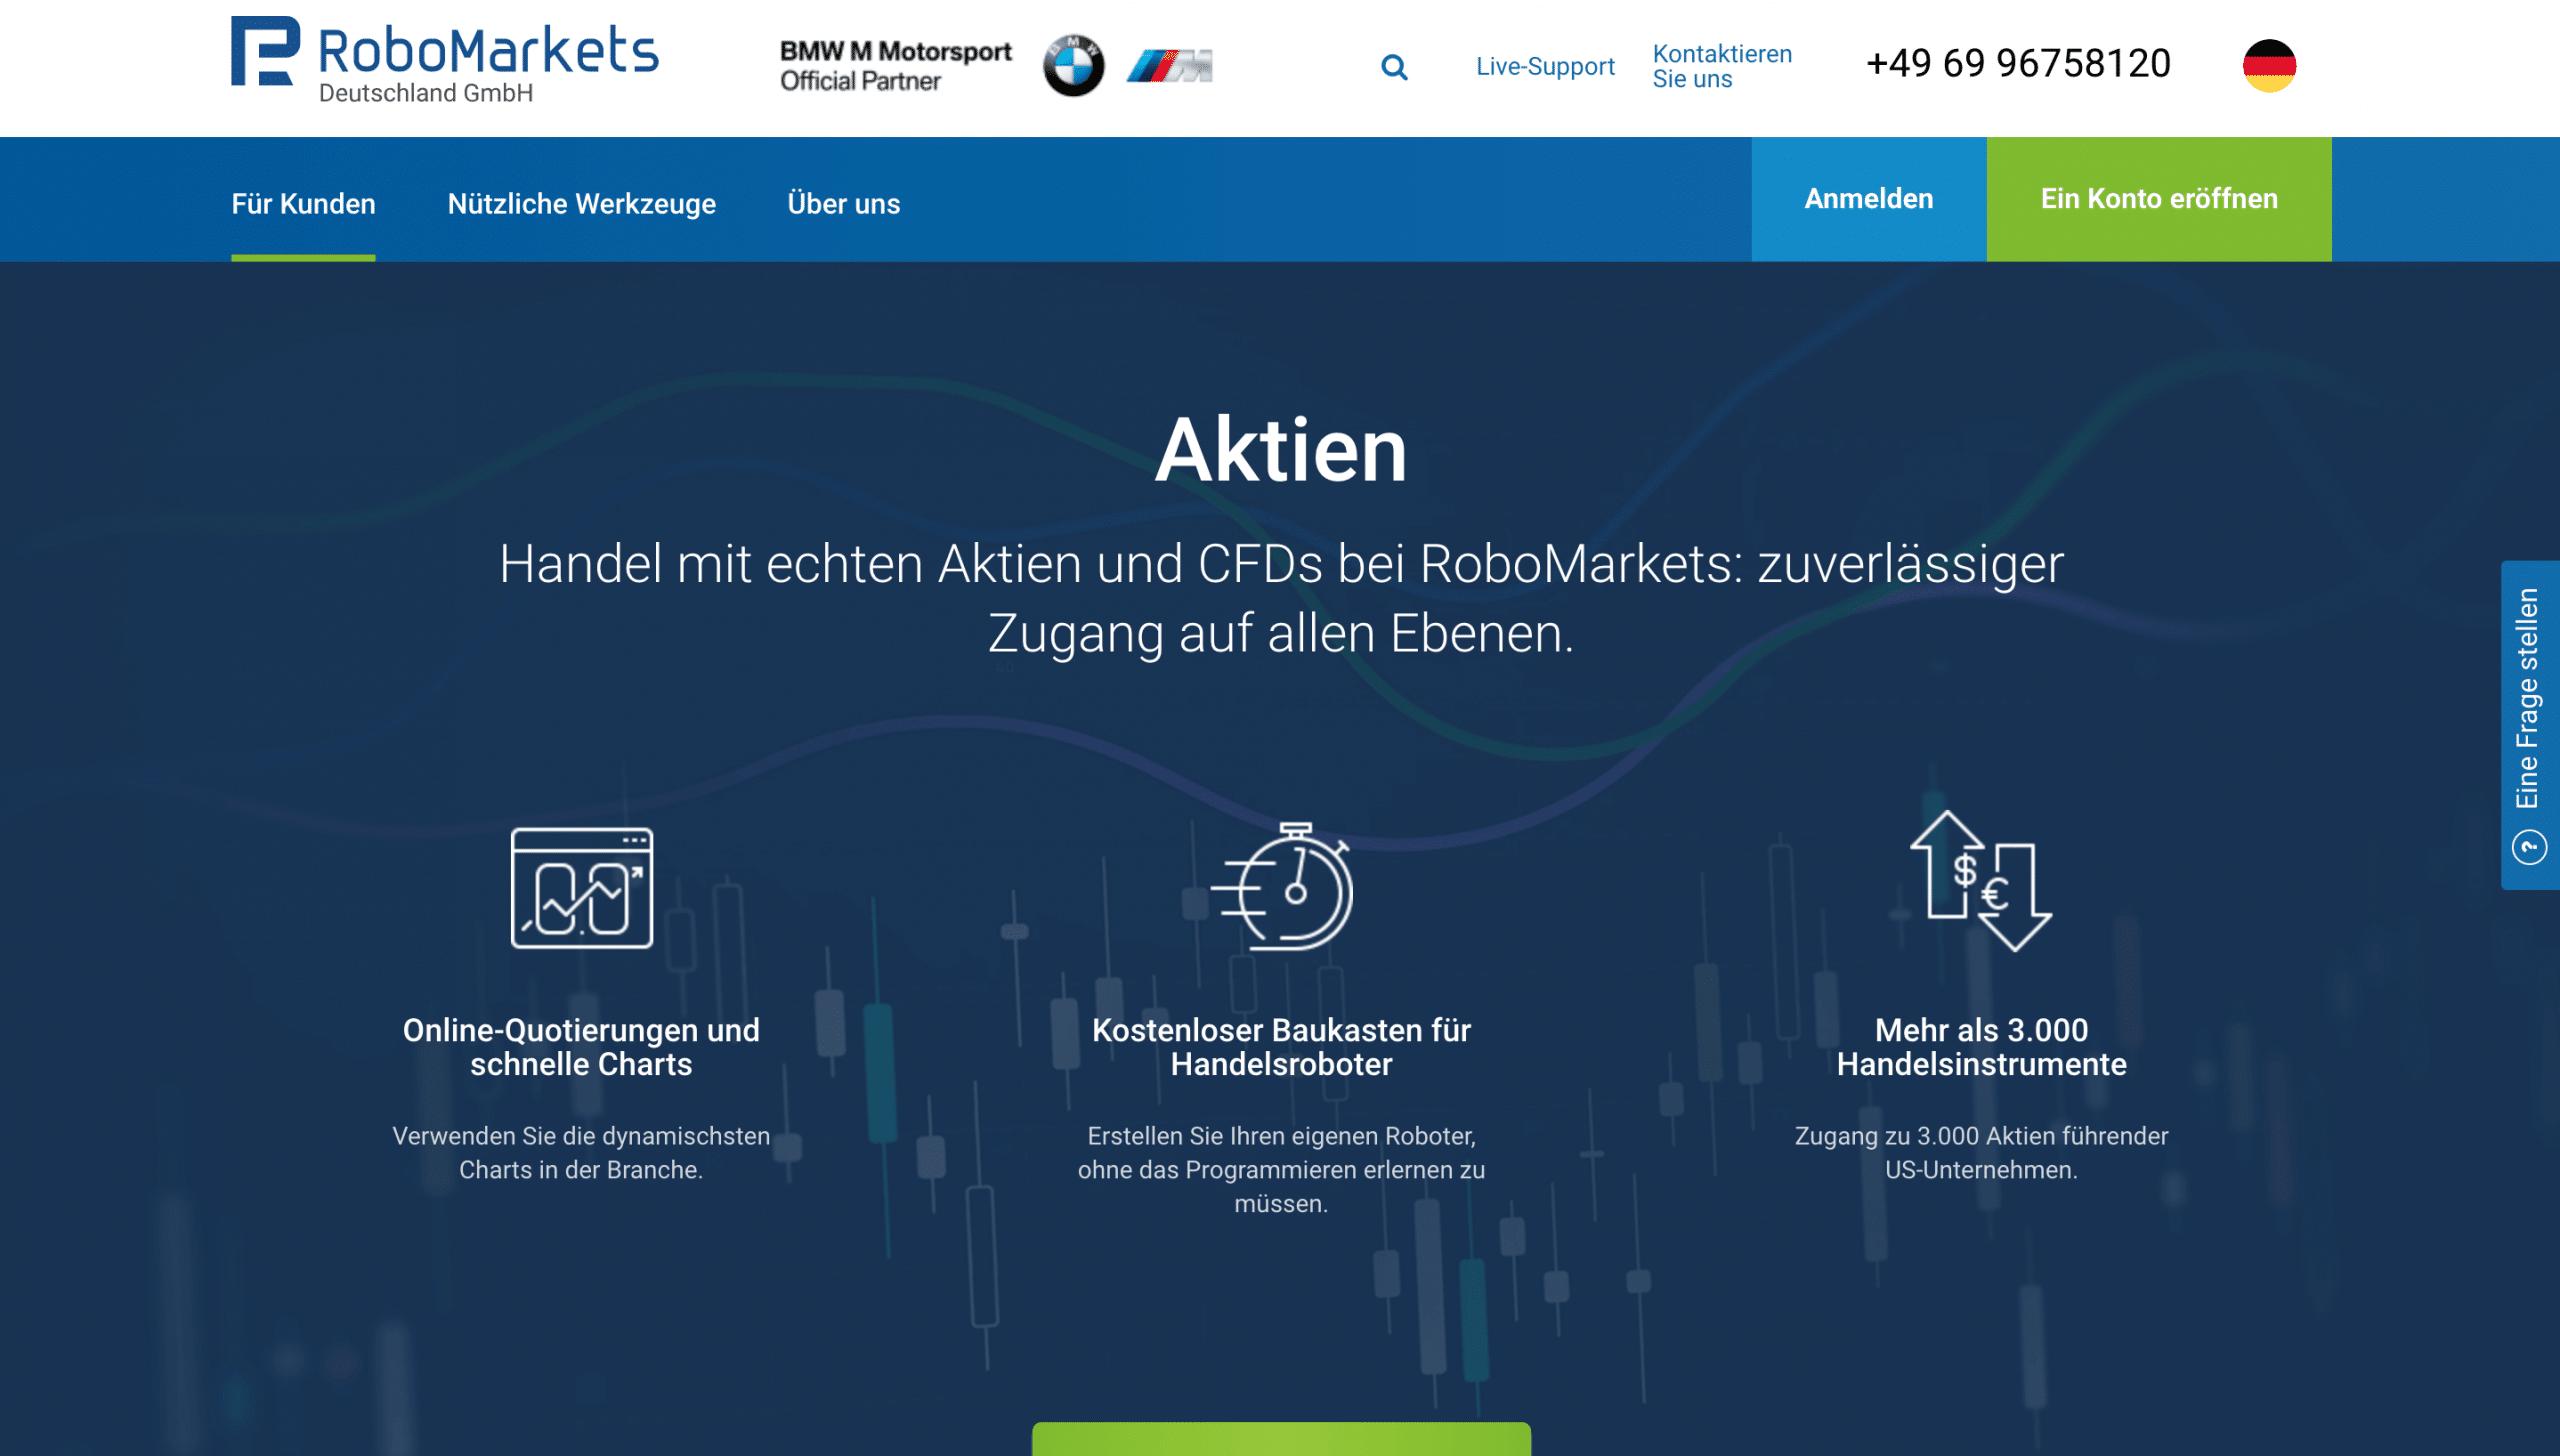 Robomarkets Aktien